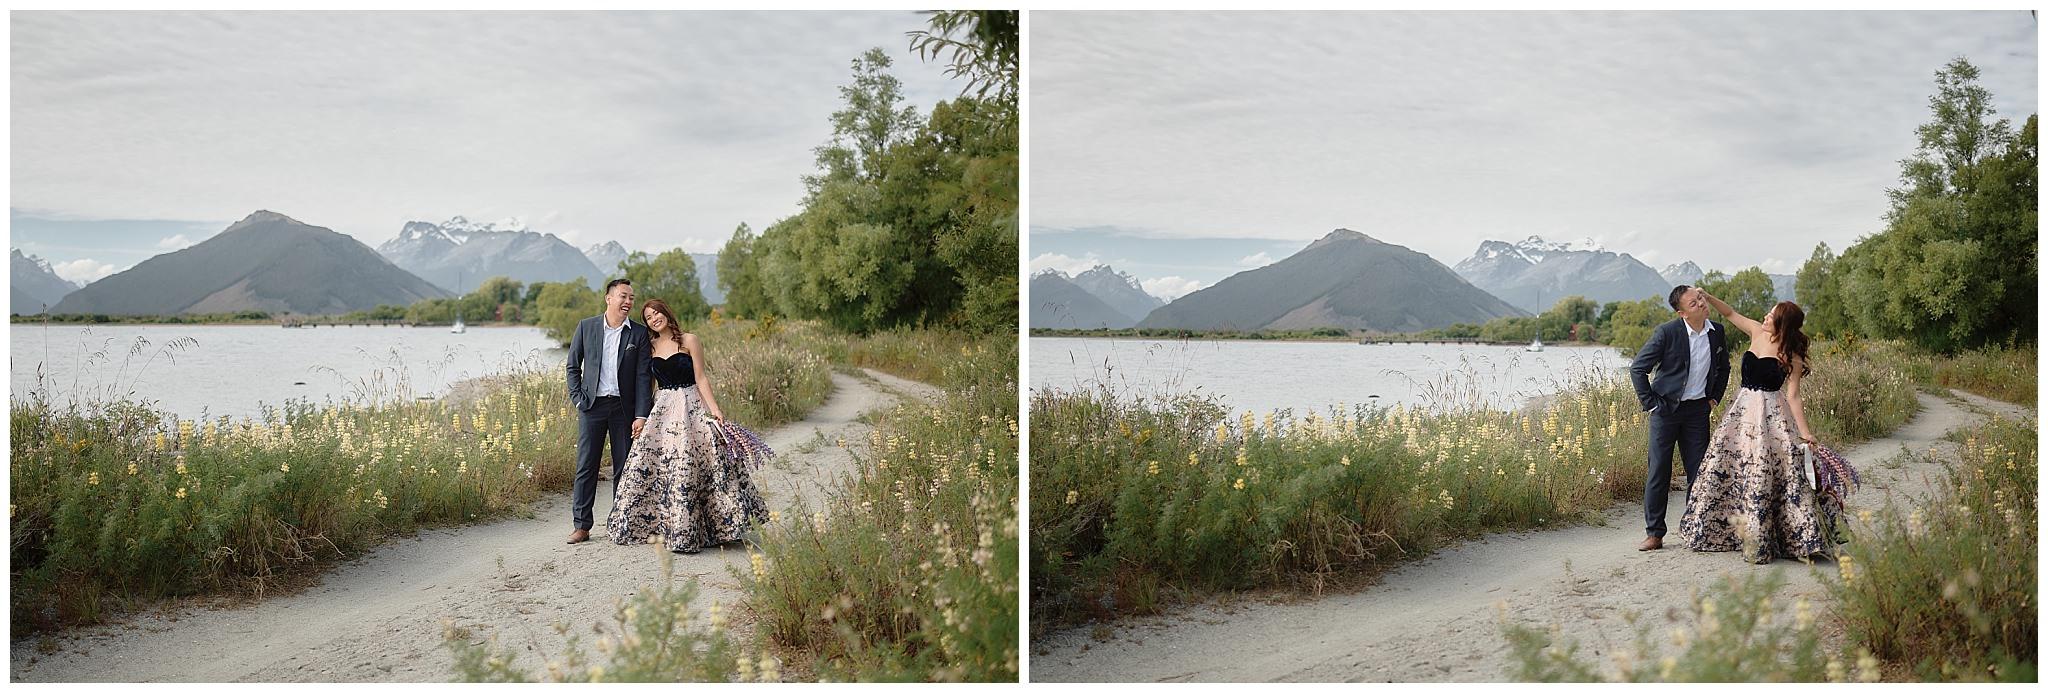 Queenstown New Zealand Prewedding Photographer_0063.jpg